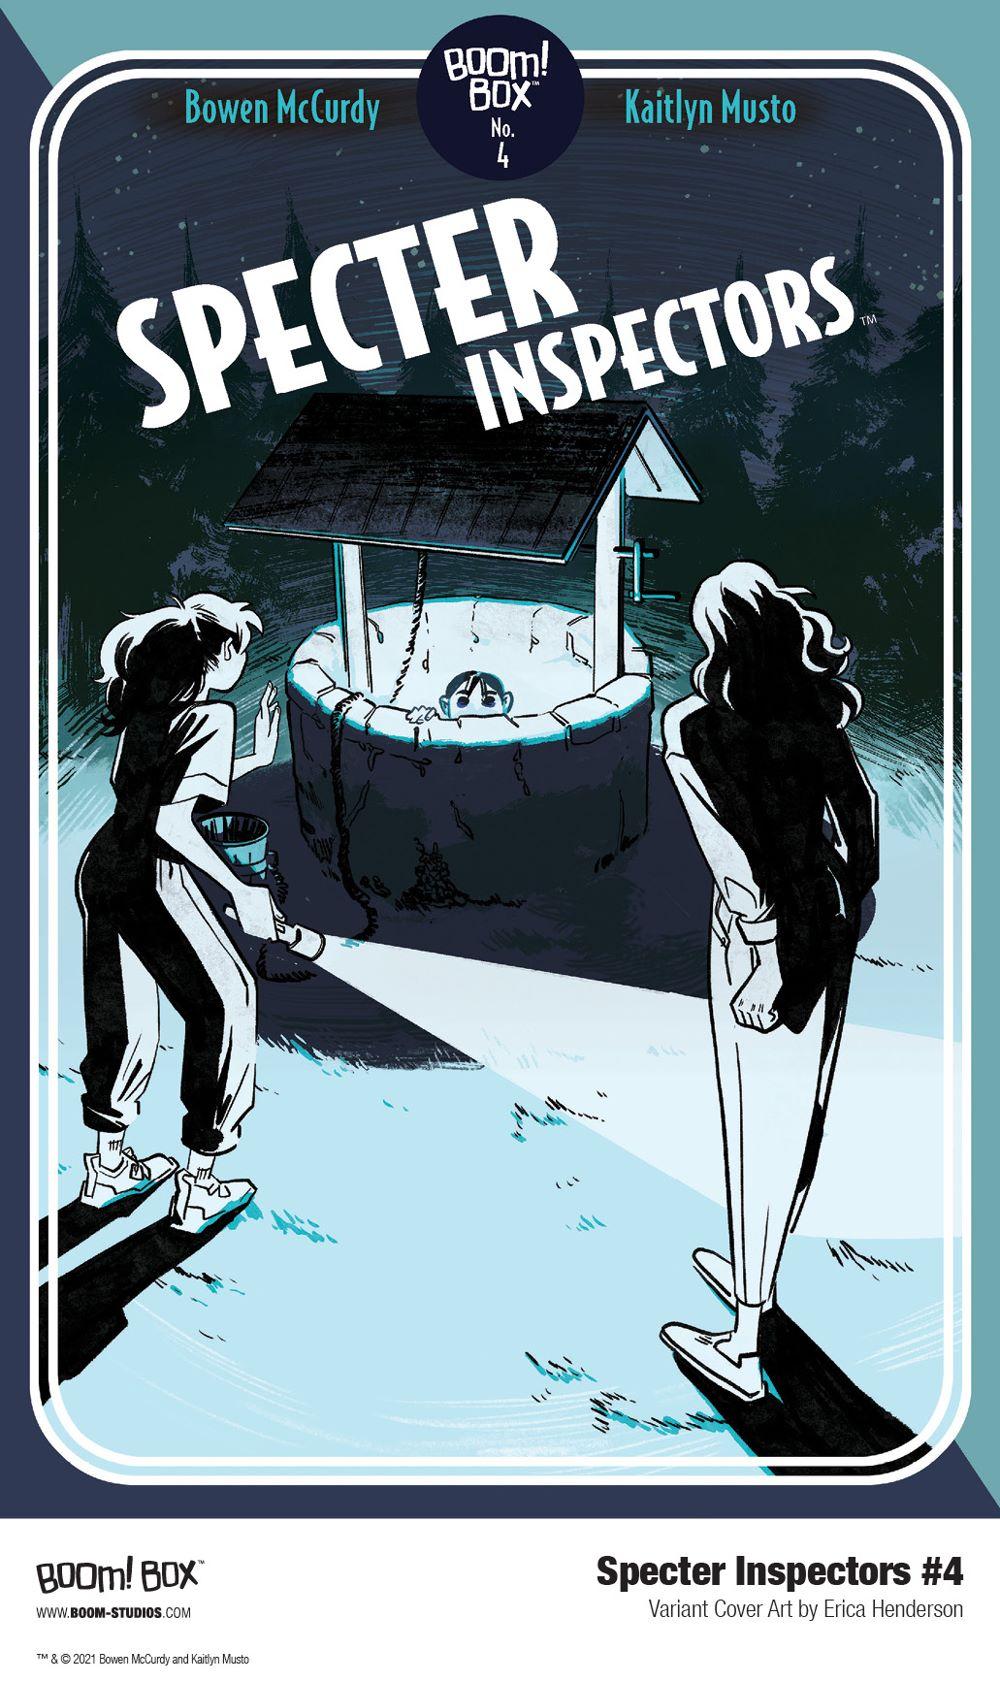 SpecterInspectors_004_Cover_Variant_Henderson_PROMO First Look at SPECTER INSPECTORS #4 from BOOM! Studios